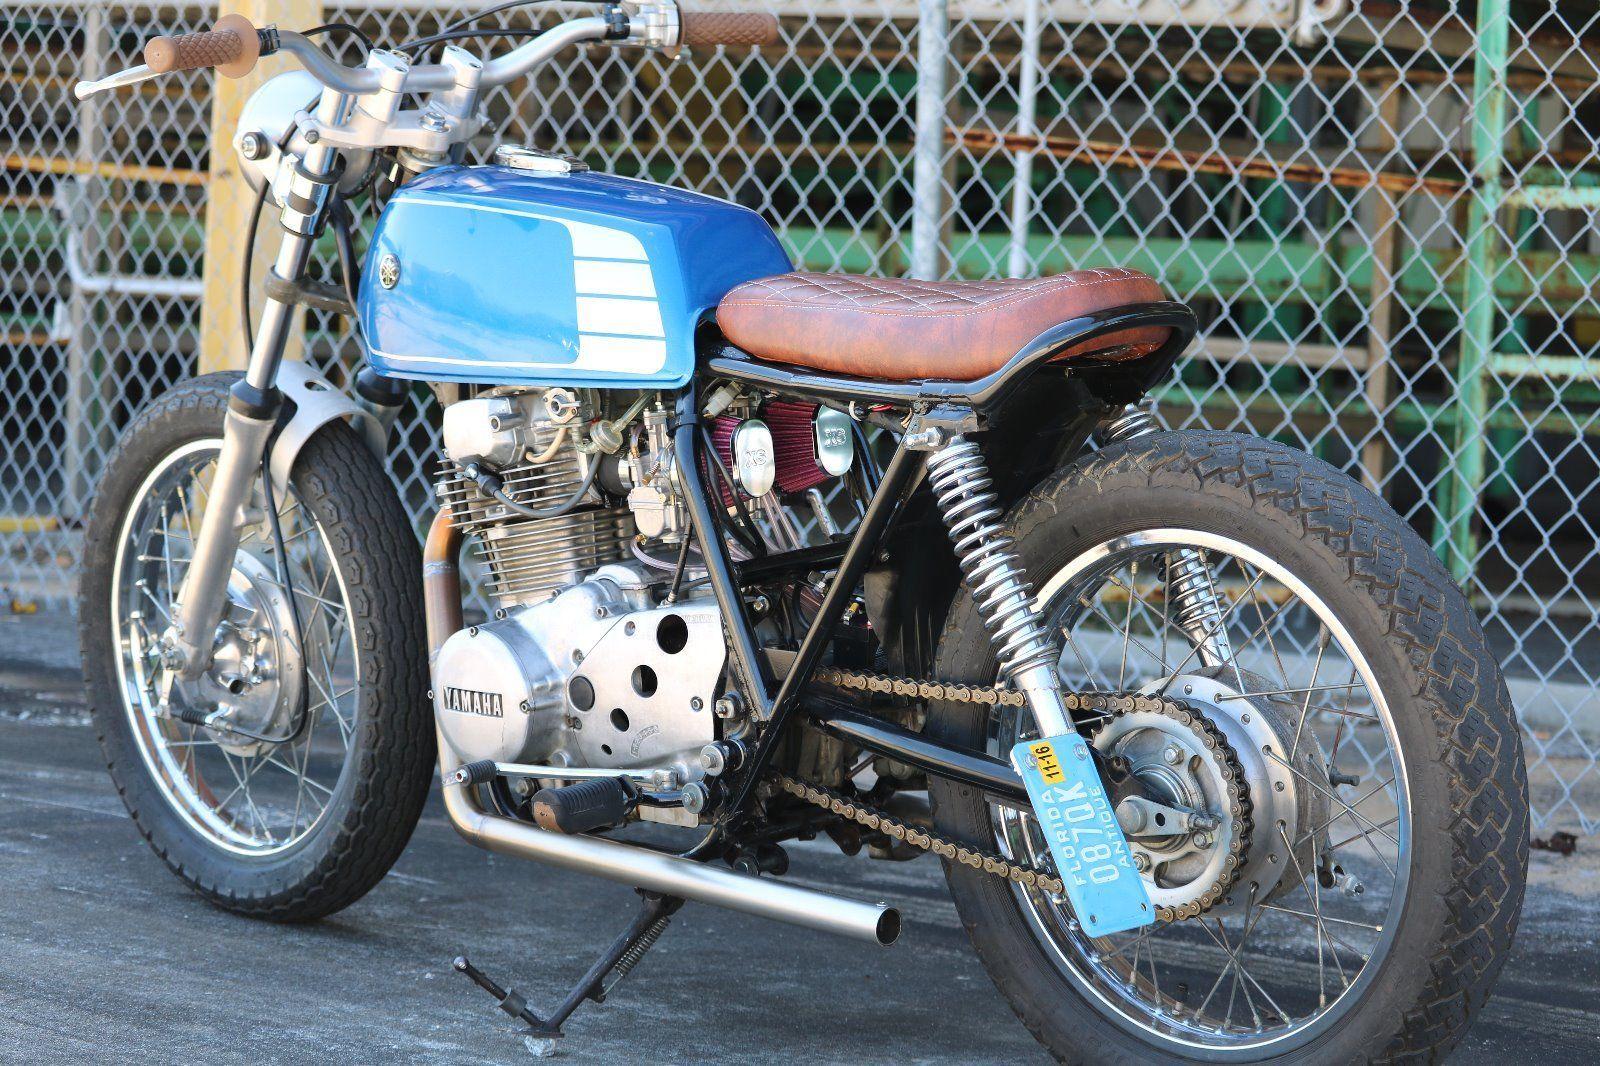 1980 Yamaha Xs Ebay Motors Motorcycles Yamaha Ebay Motorcycle Brat Bike Yamaha